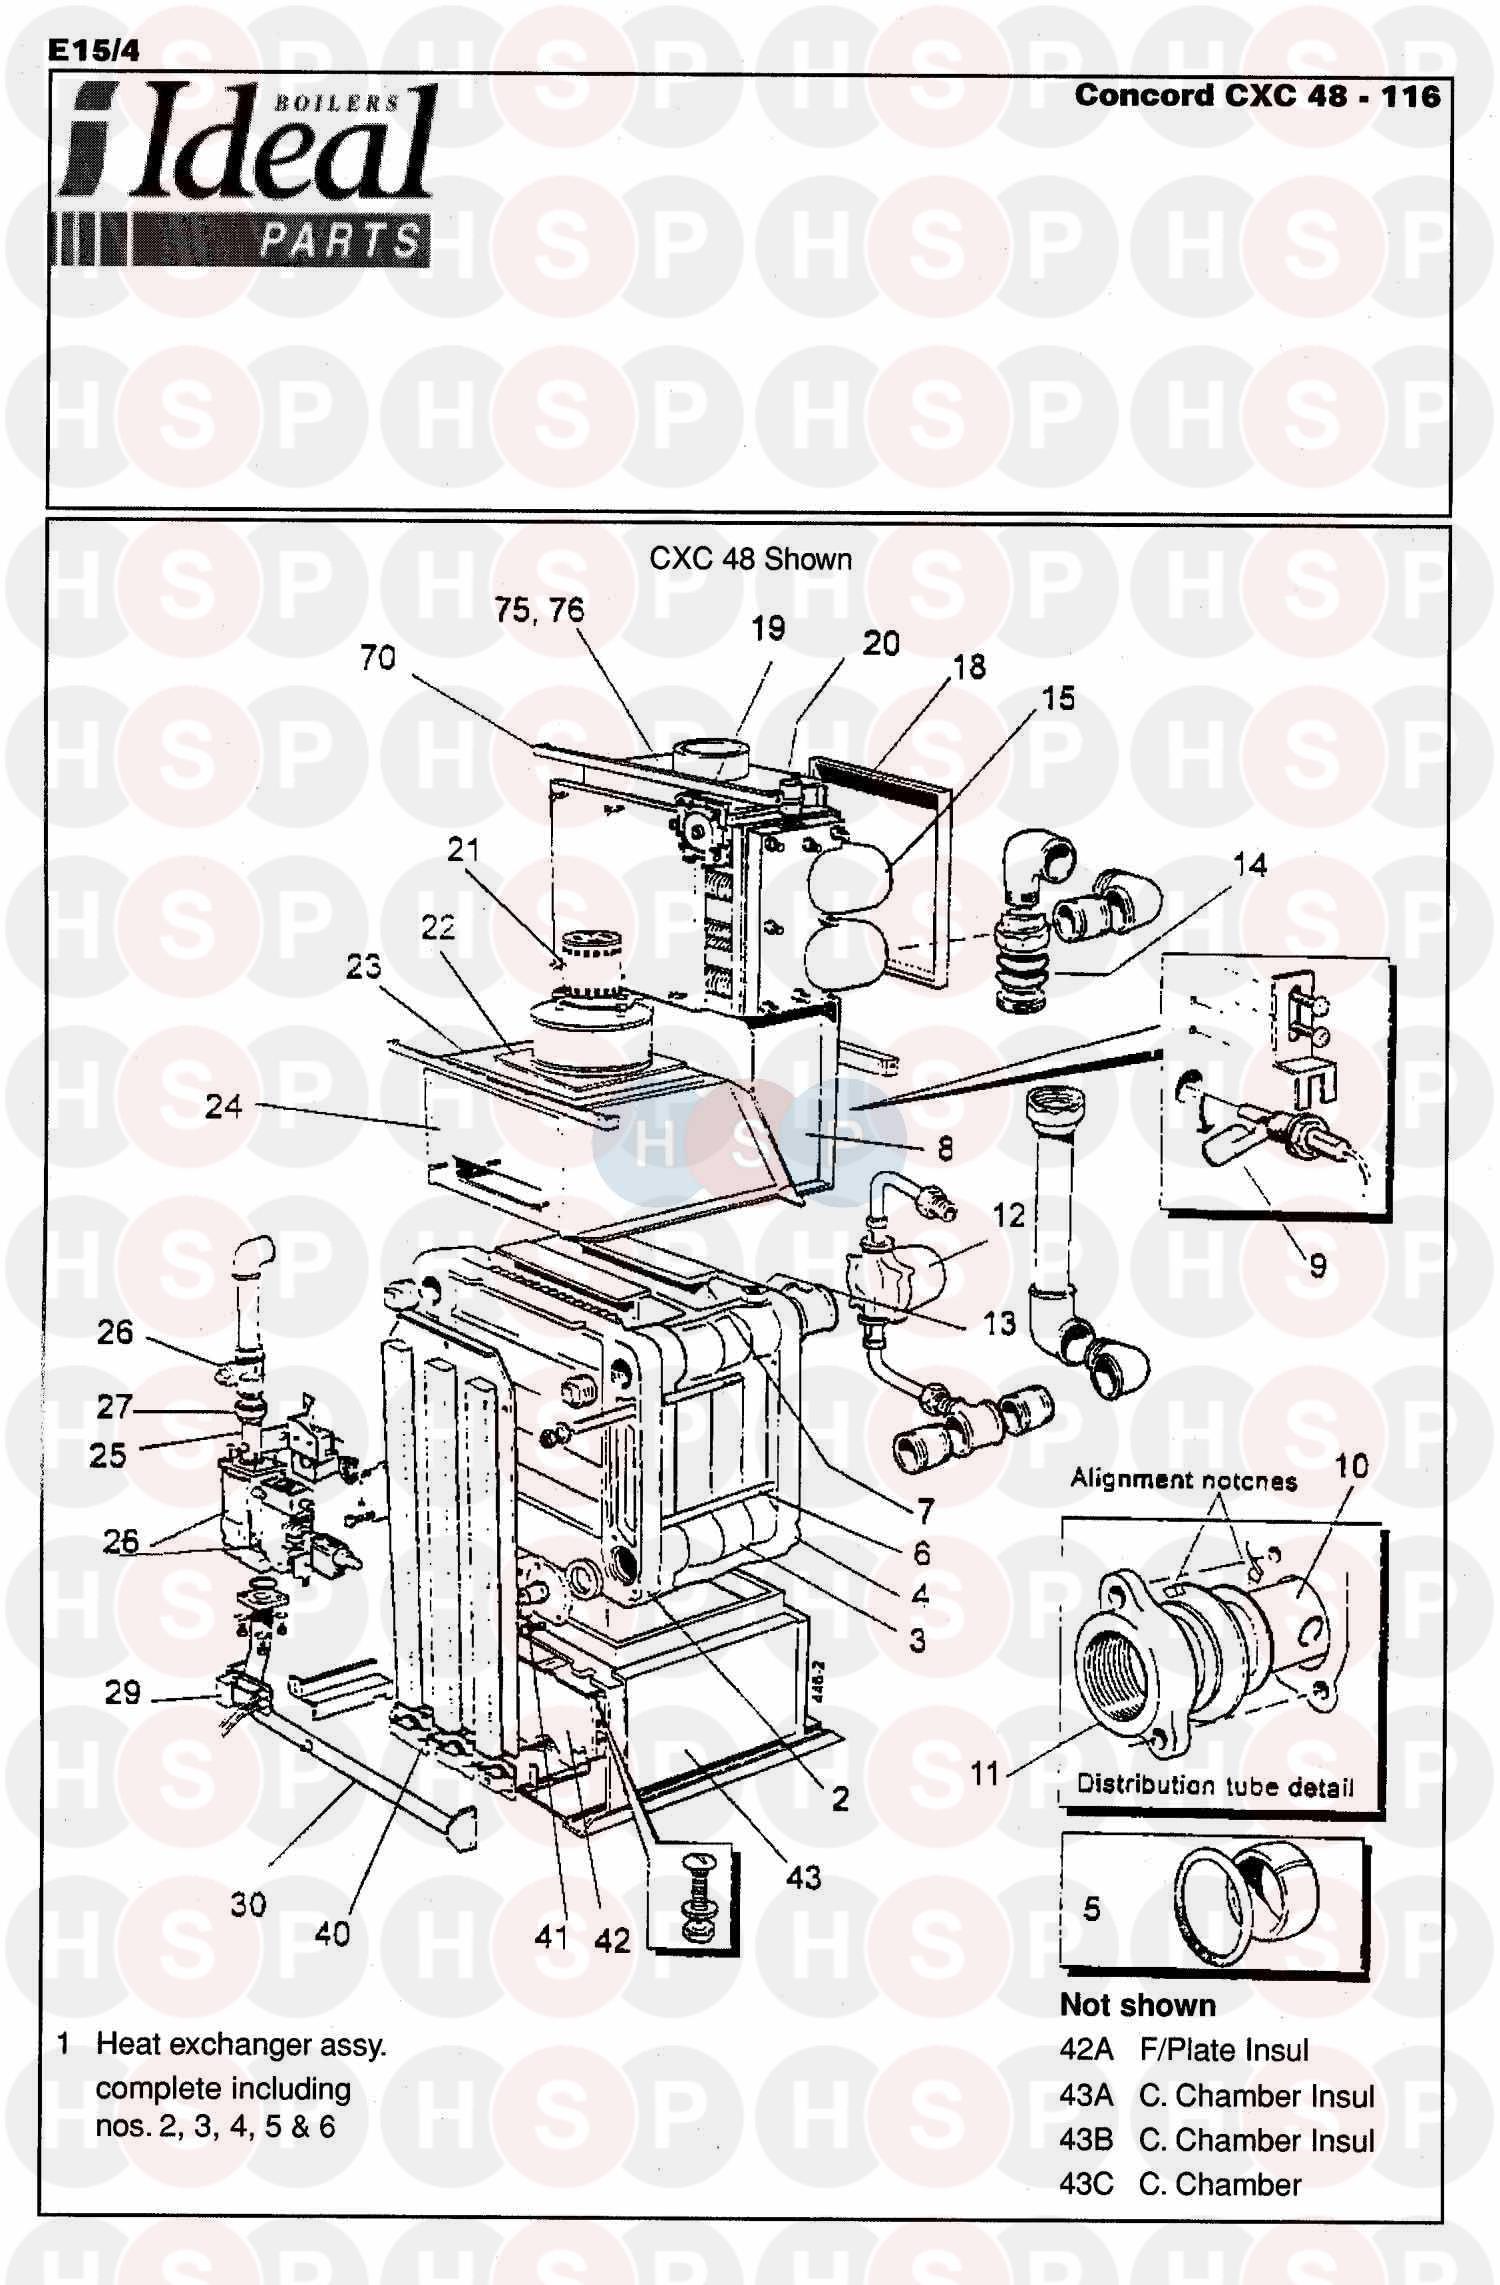 ideal concord cxc 70 boiler assembly 1 diagram. Black Bedroom Furniture Sets. Home Design Ideas